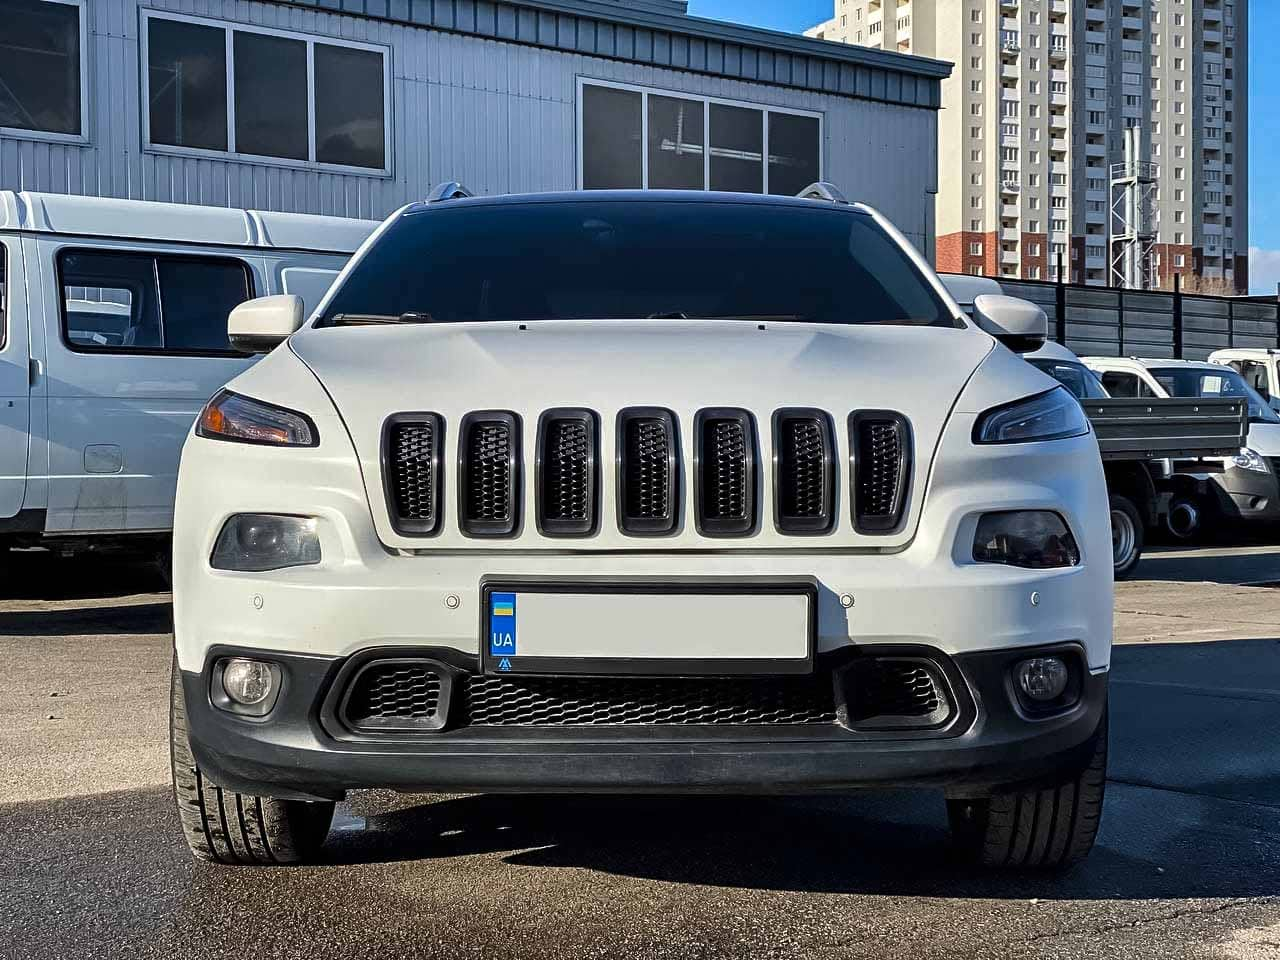 2014 Jeep CHEROKEE | Vin: 1C4PJMDB9EW255314